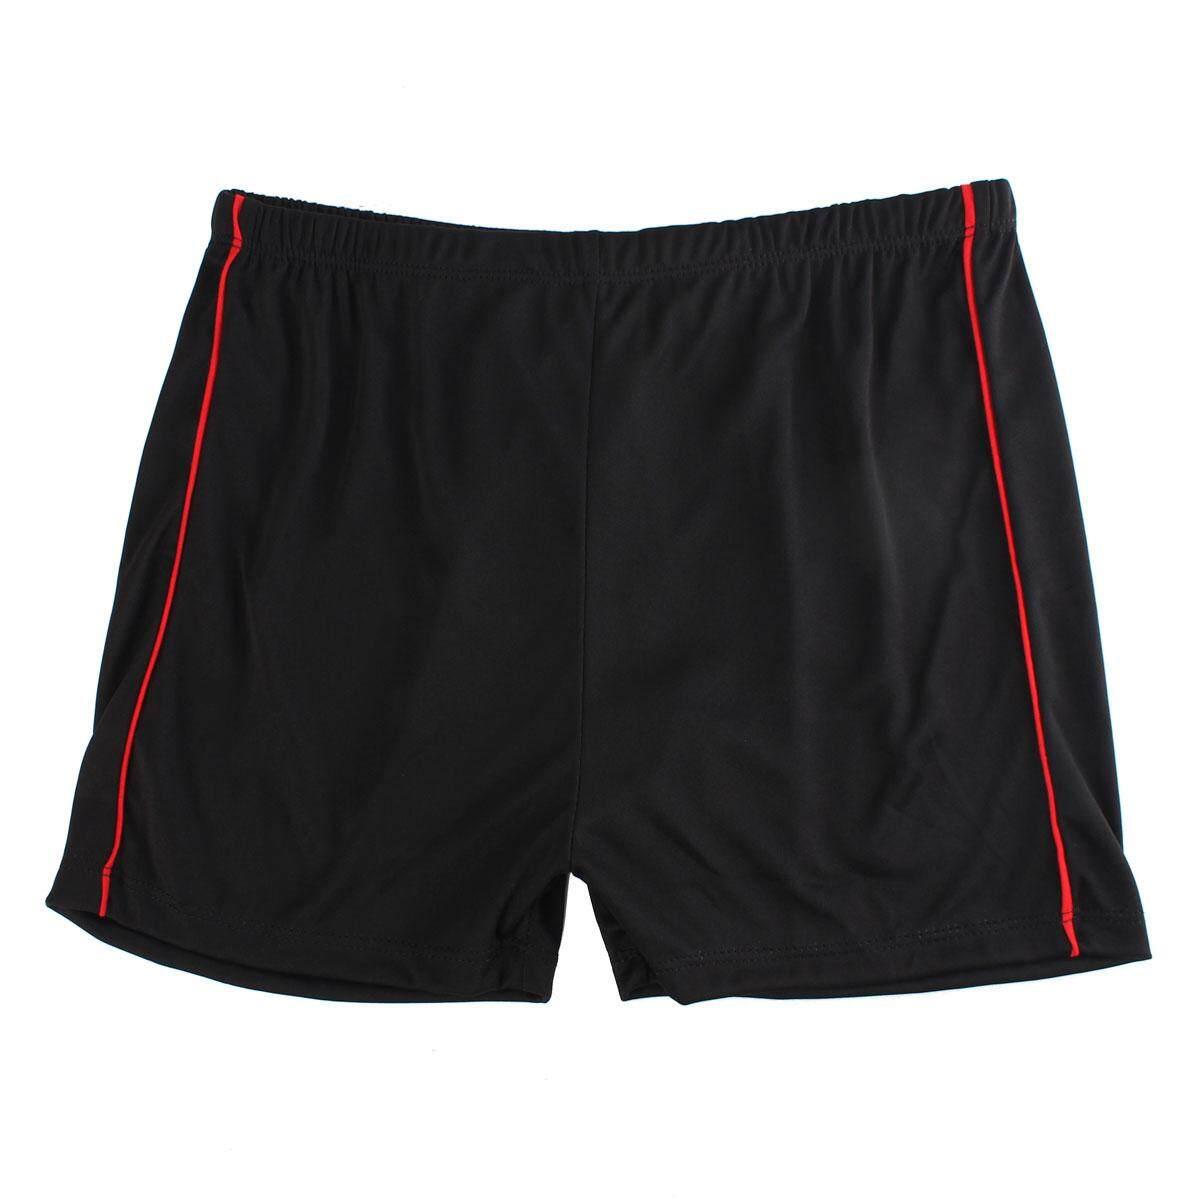 Mens Hot Swimming Shorts Swim Trunks Tether Base Layer Swimwear Beachwear Underwear Xl By Freebang.